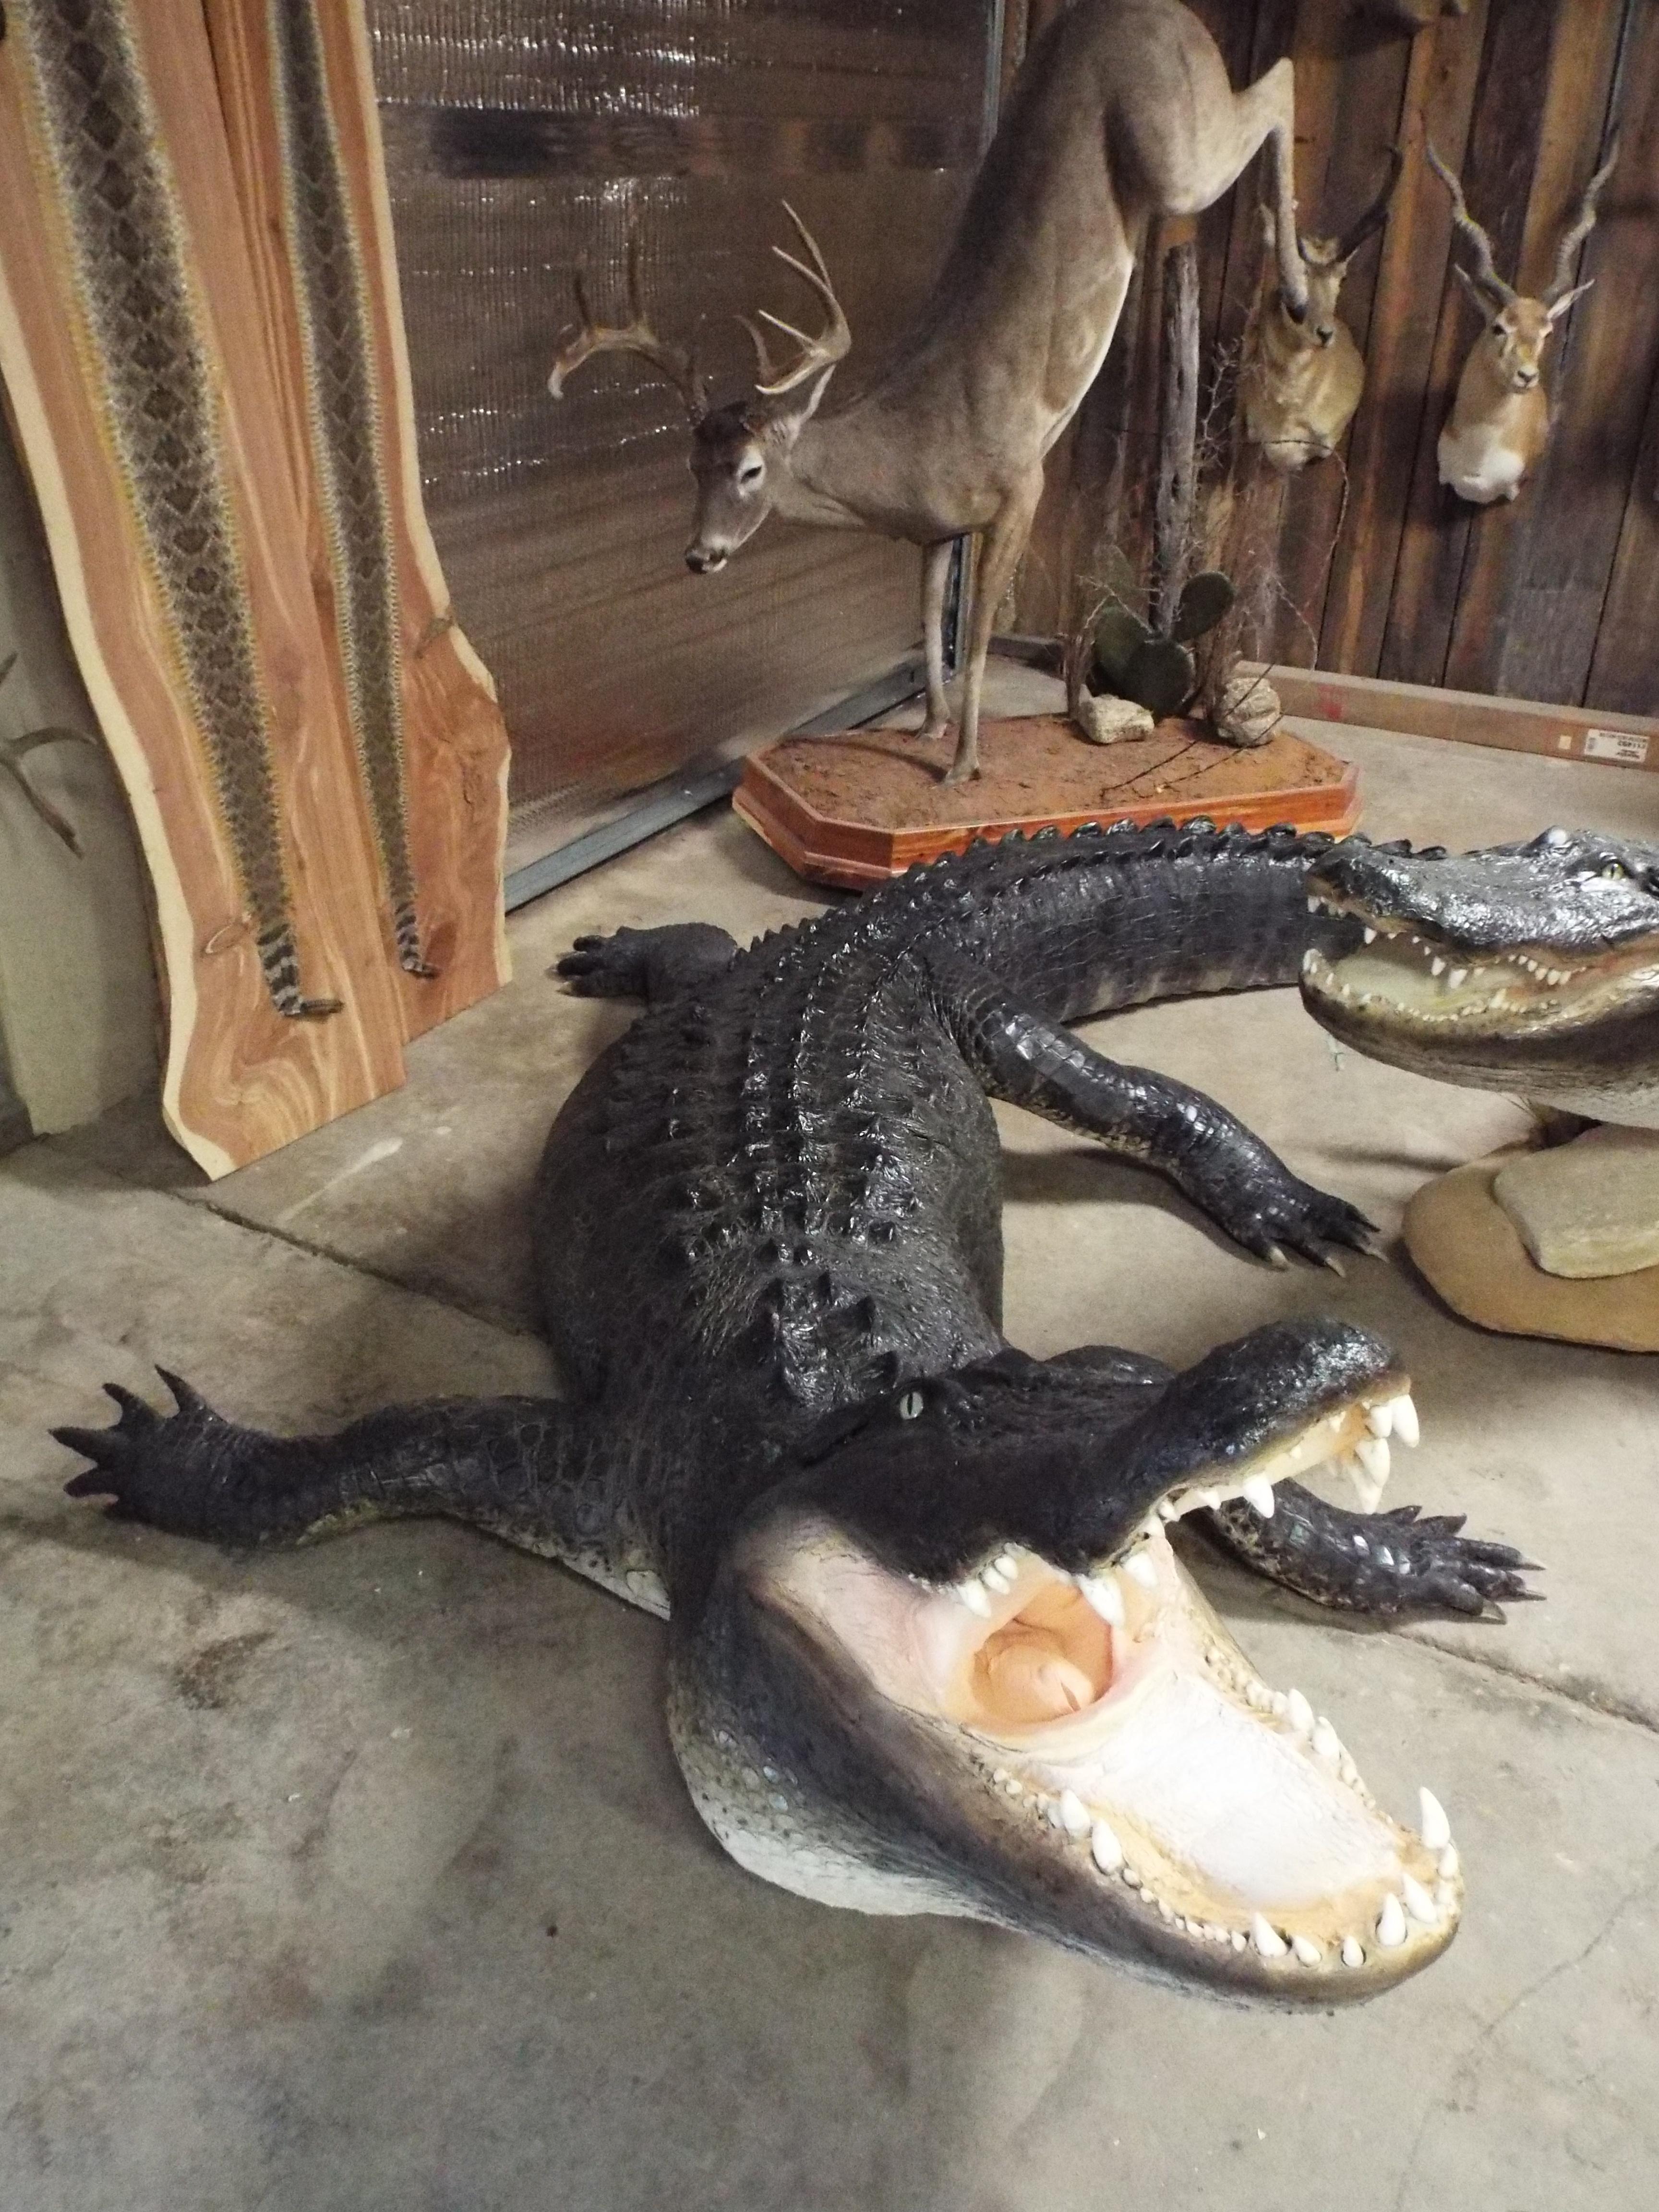 https://0201.nccdn.net/1_2/000/000/0f2/9d0/gators-044-3456x4608.jpg